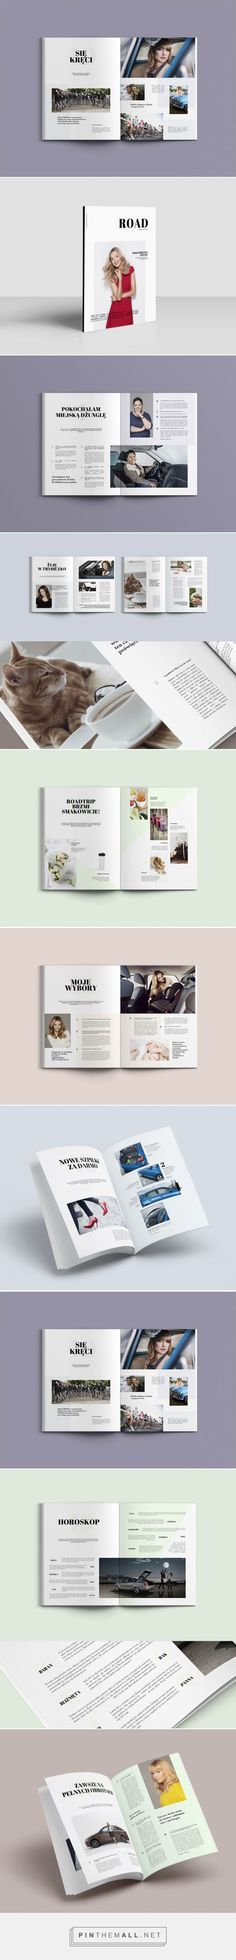 Editorial Design Inspiration: Road Lifestyle Magazine